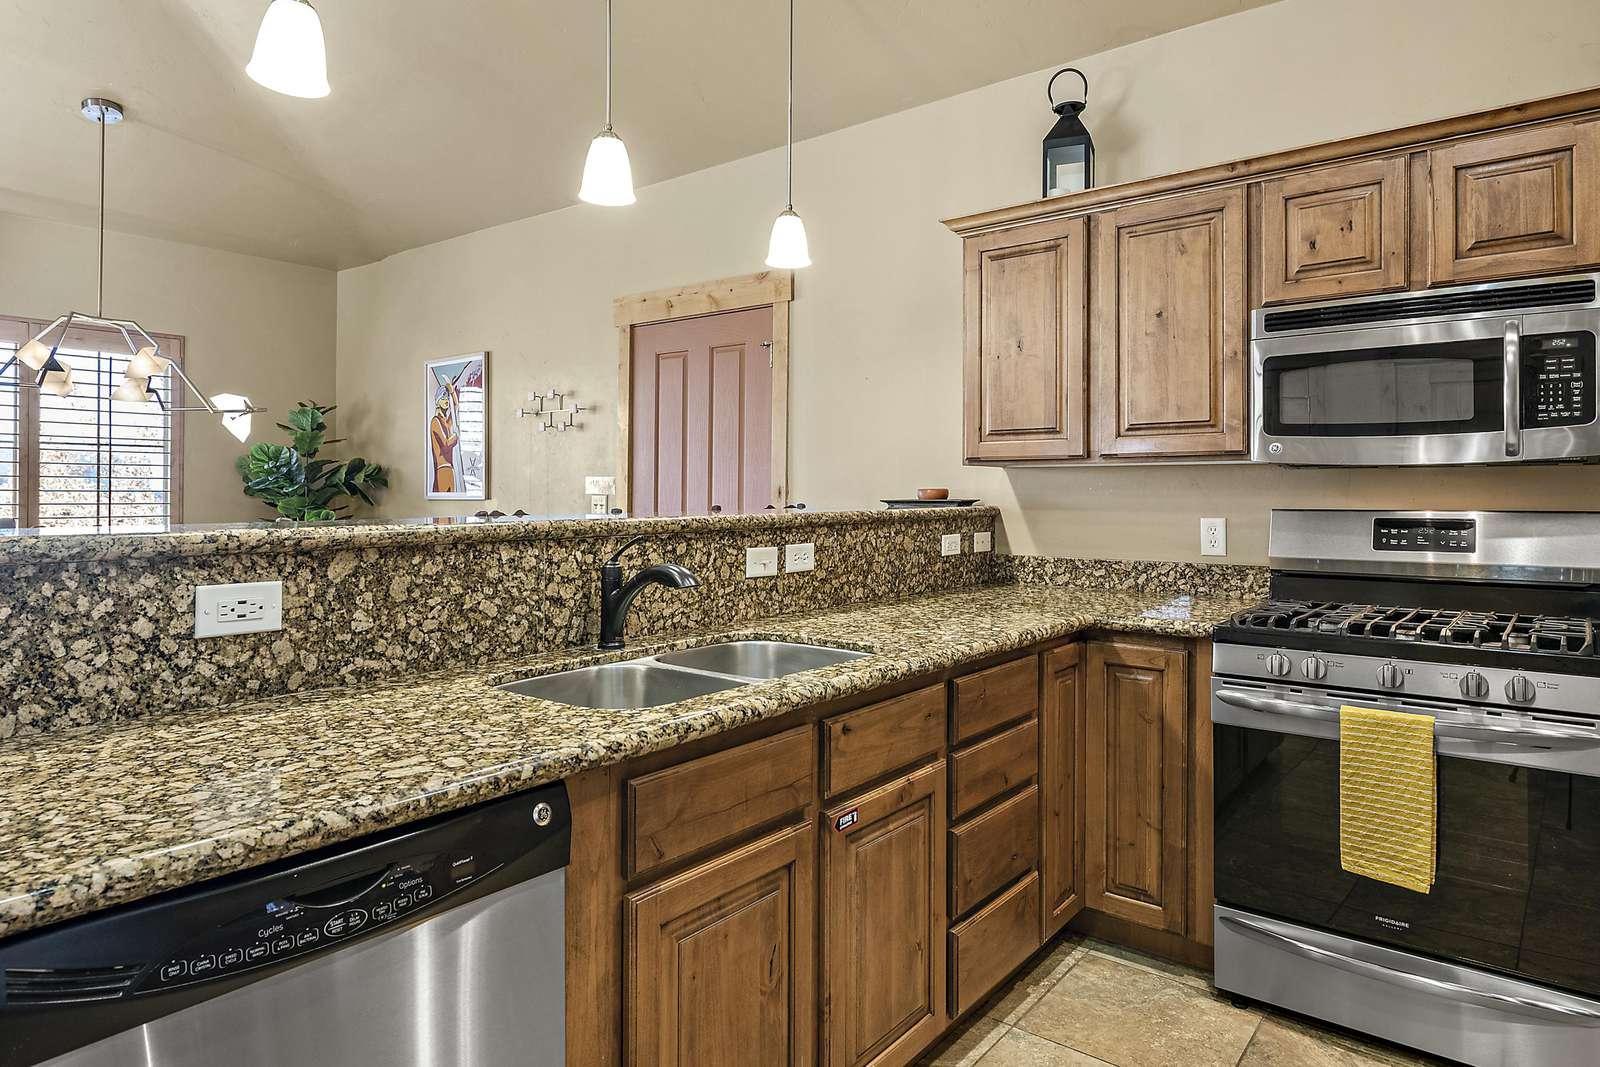 Plenty of preparation room with dishwasher